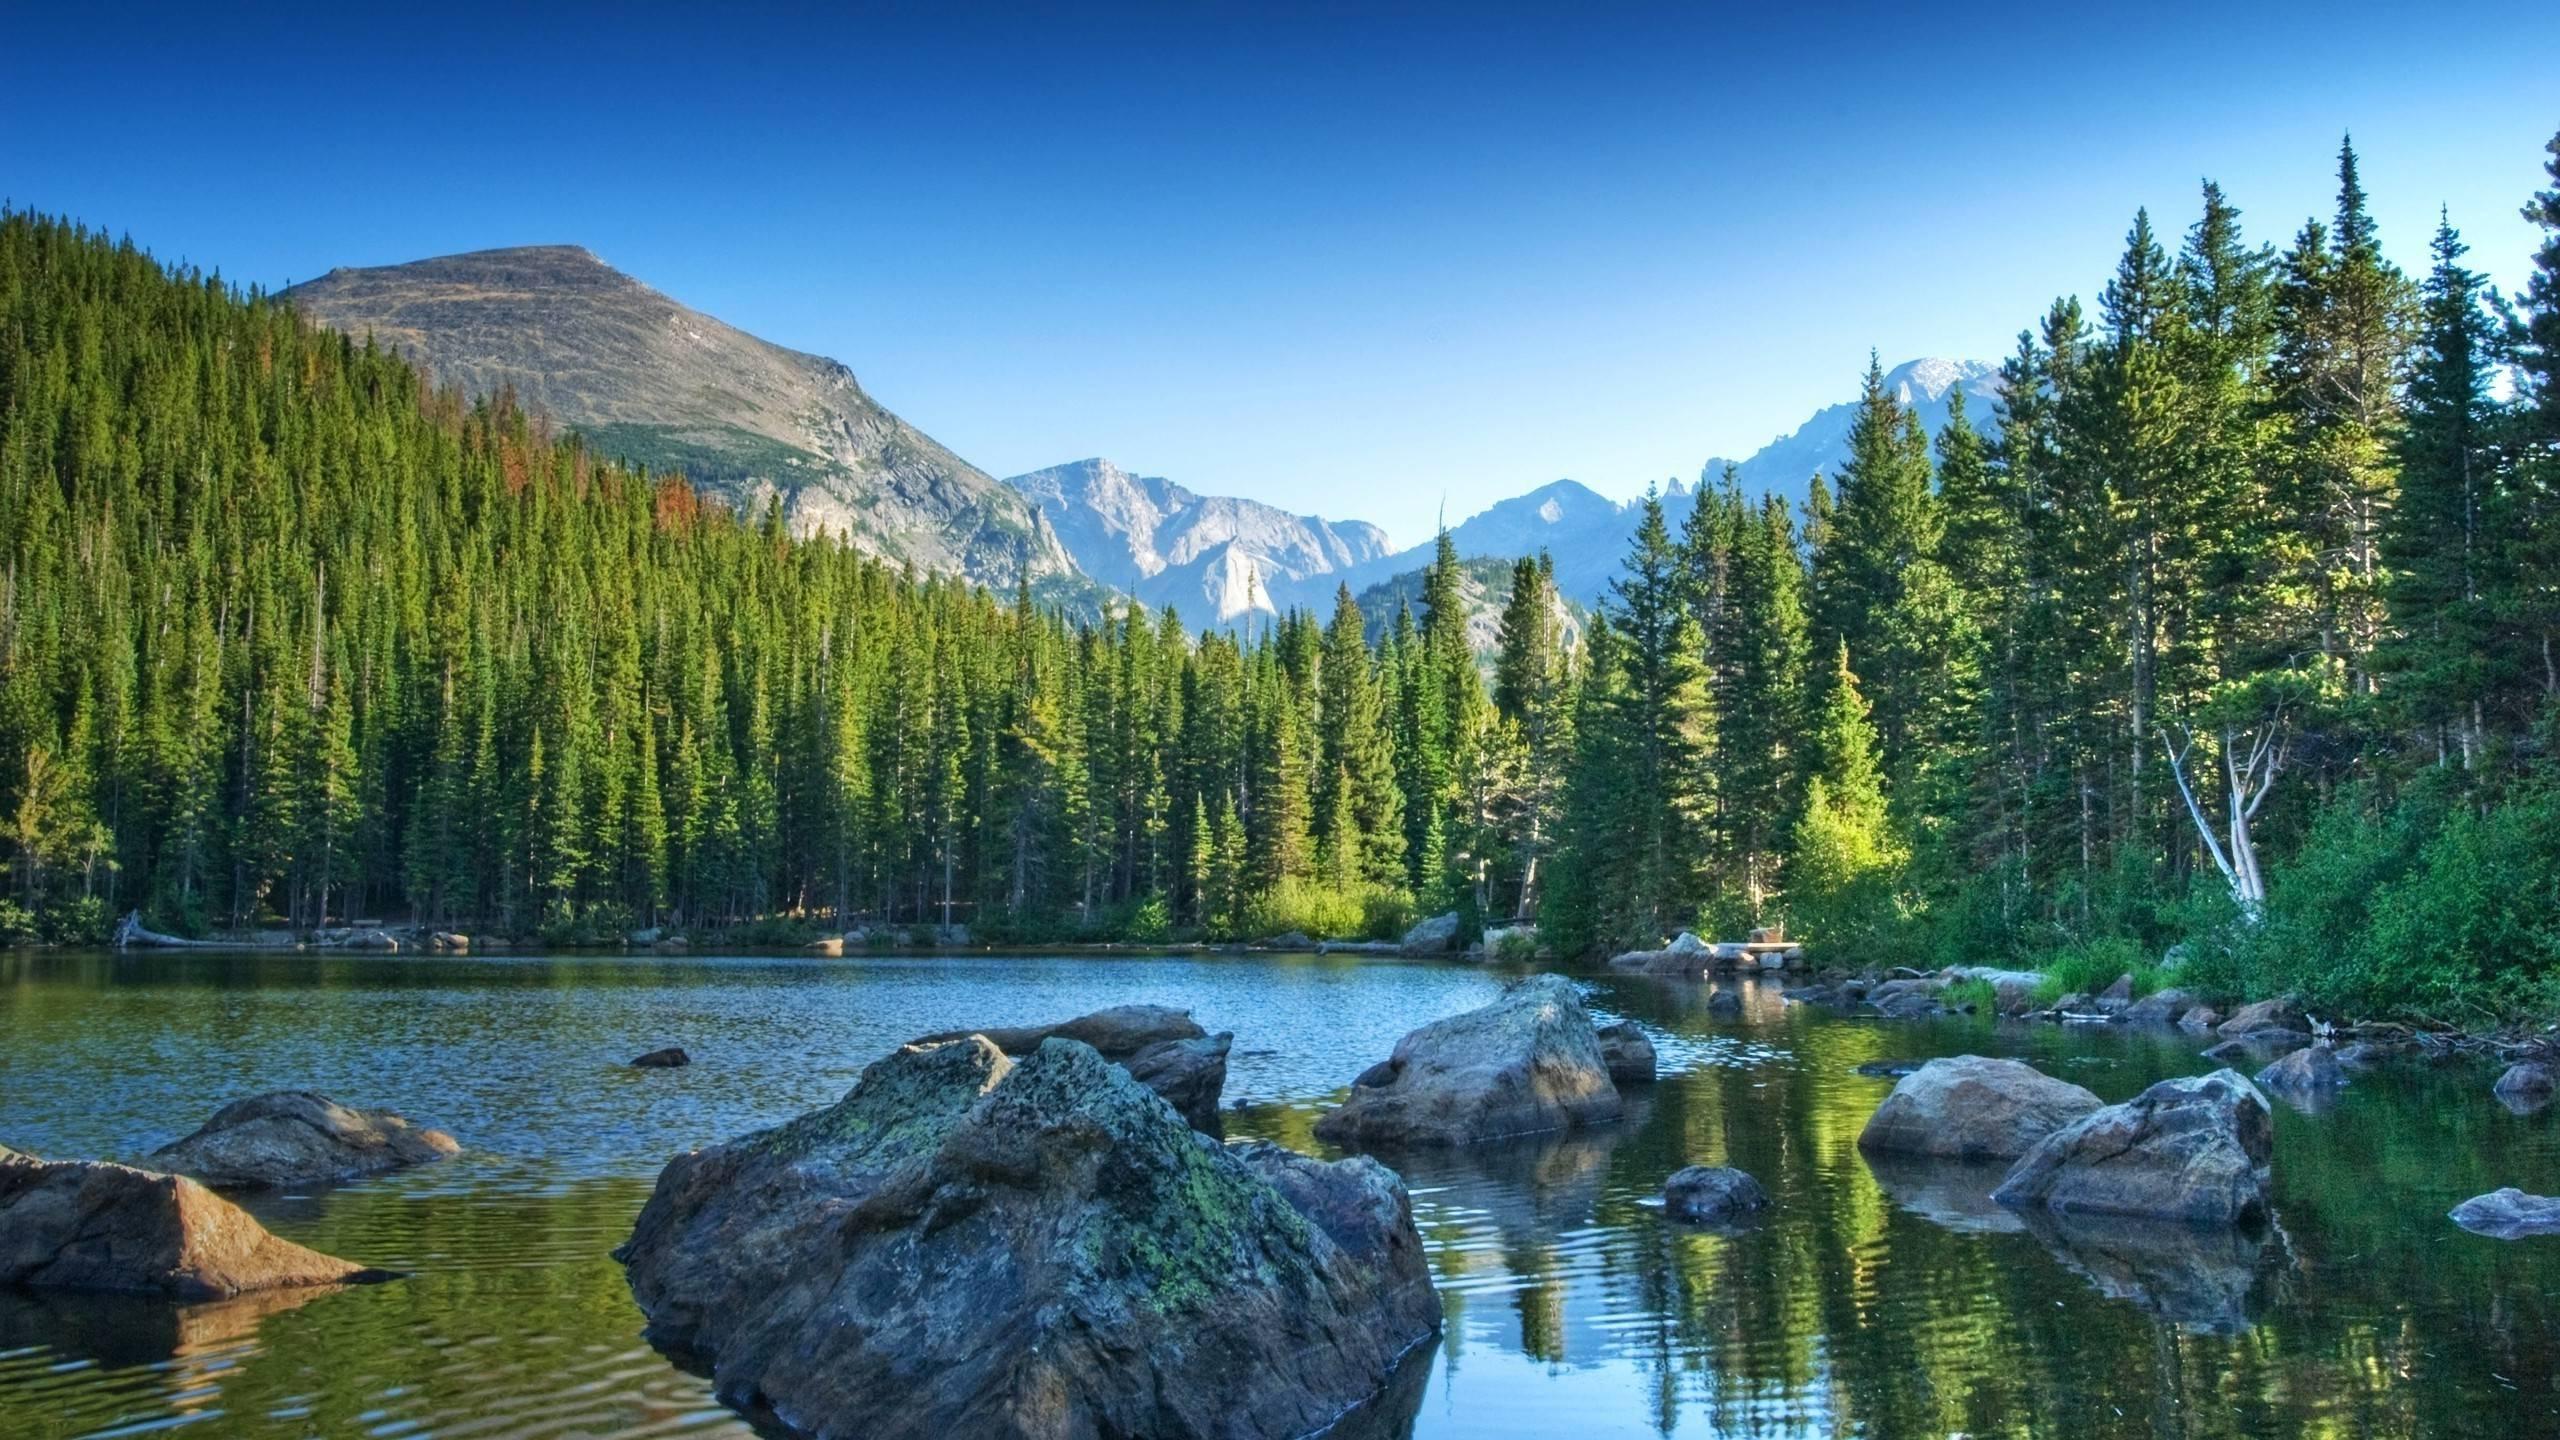 bear lake rocky mountain national park wallpaper